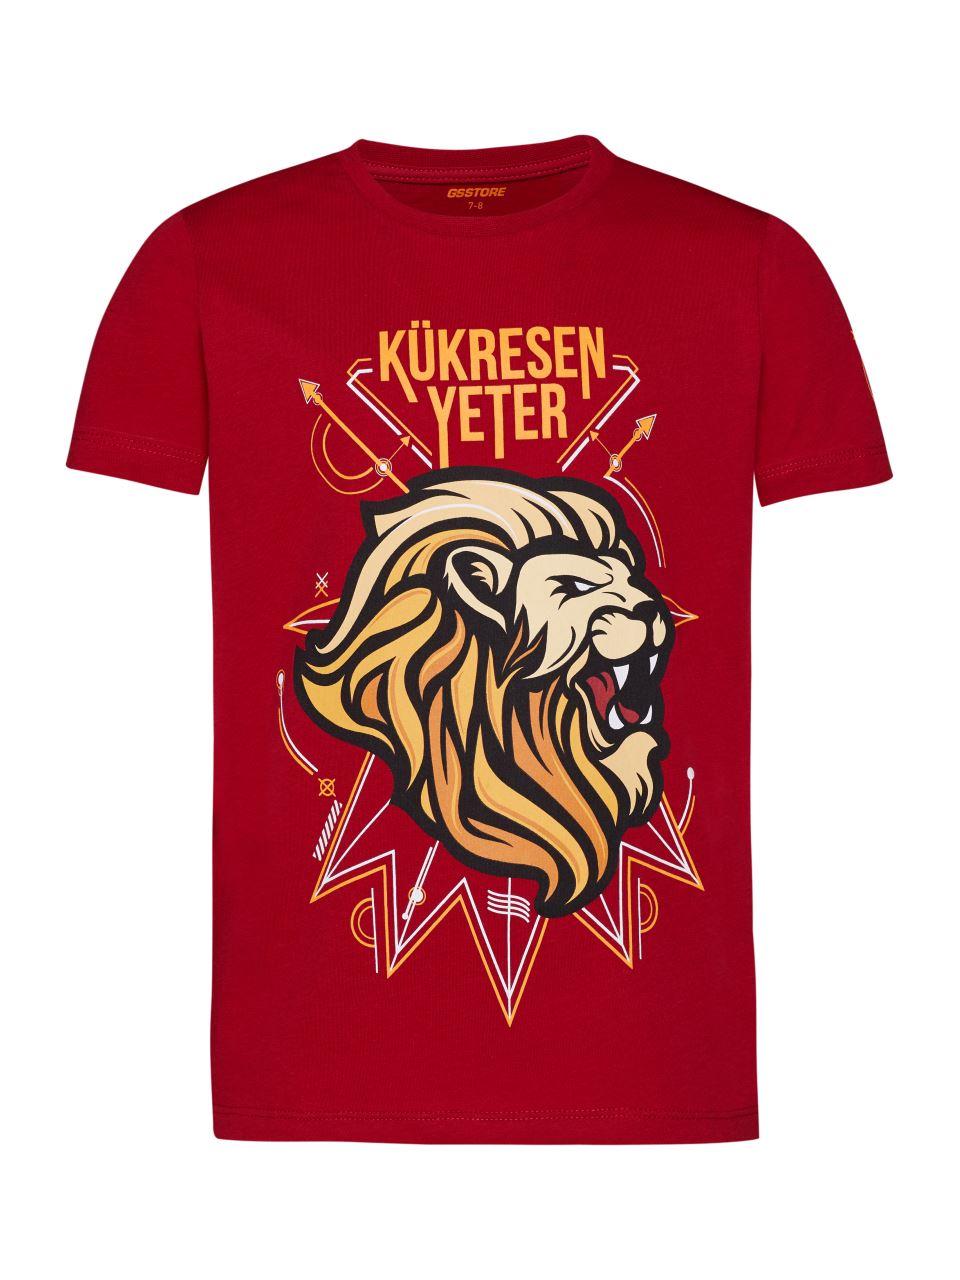 Galatasaray Kükresen Yeter 3D Çocuk T-shirt C191234